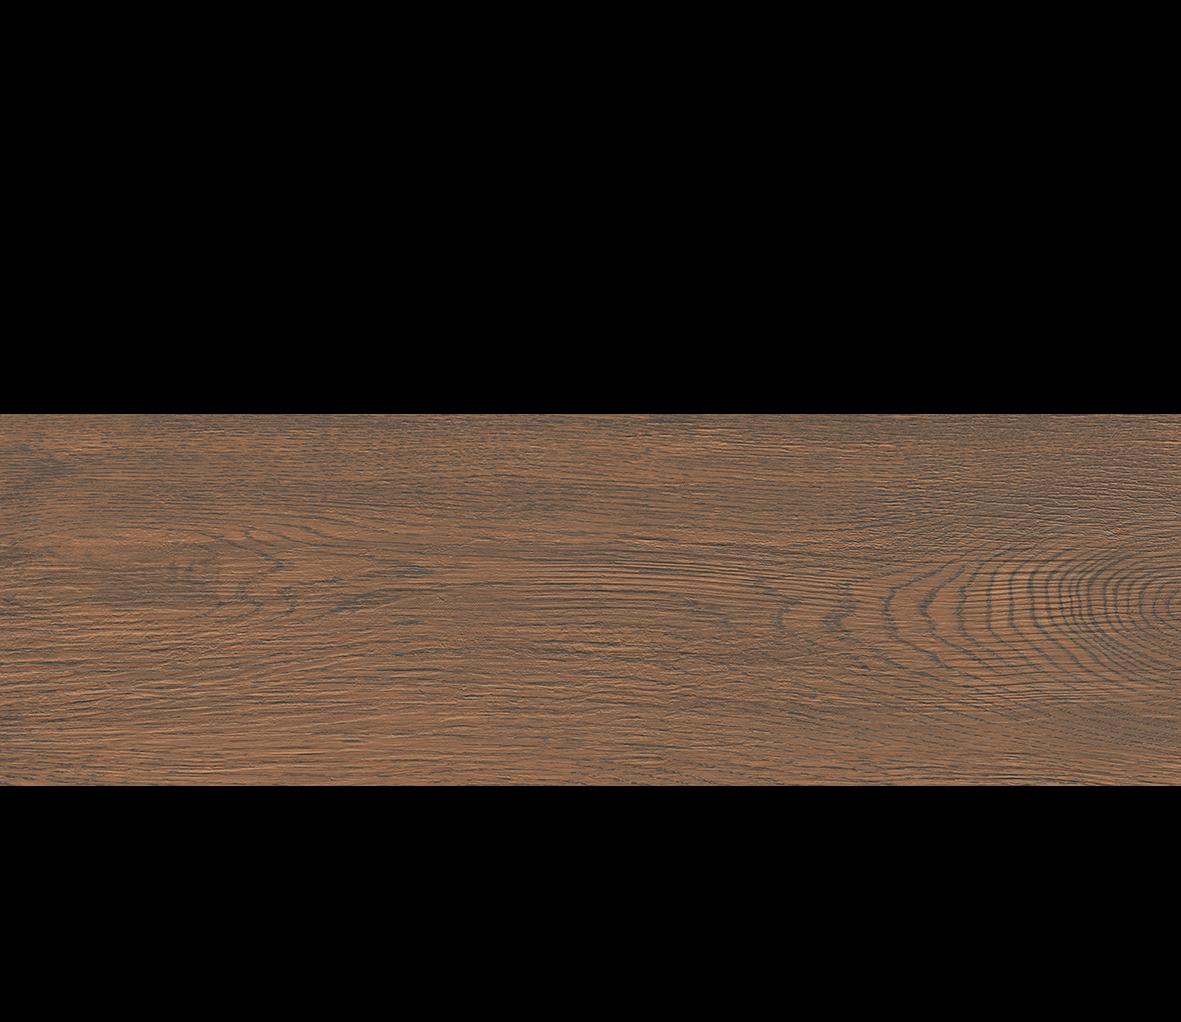 Плитка Cersanit Finwood Ochra   18,5x59,8